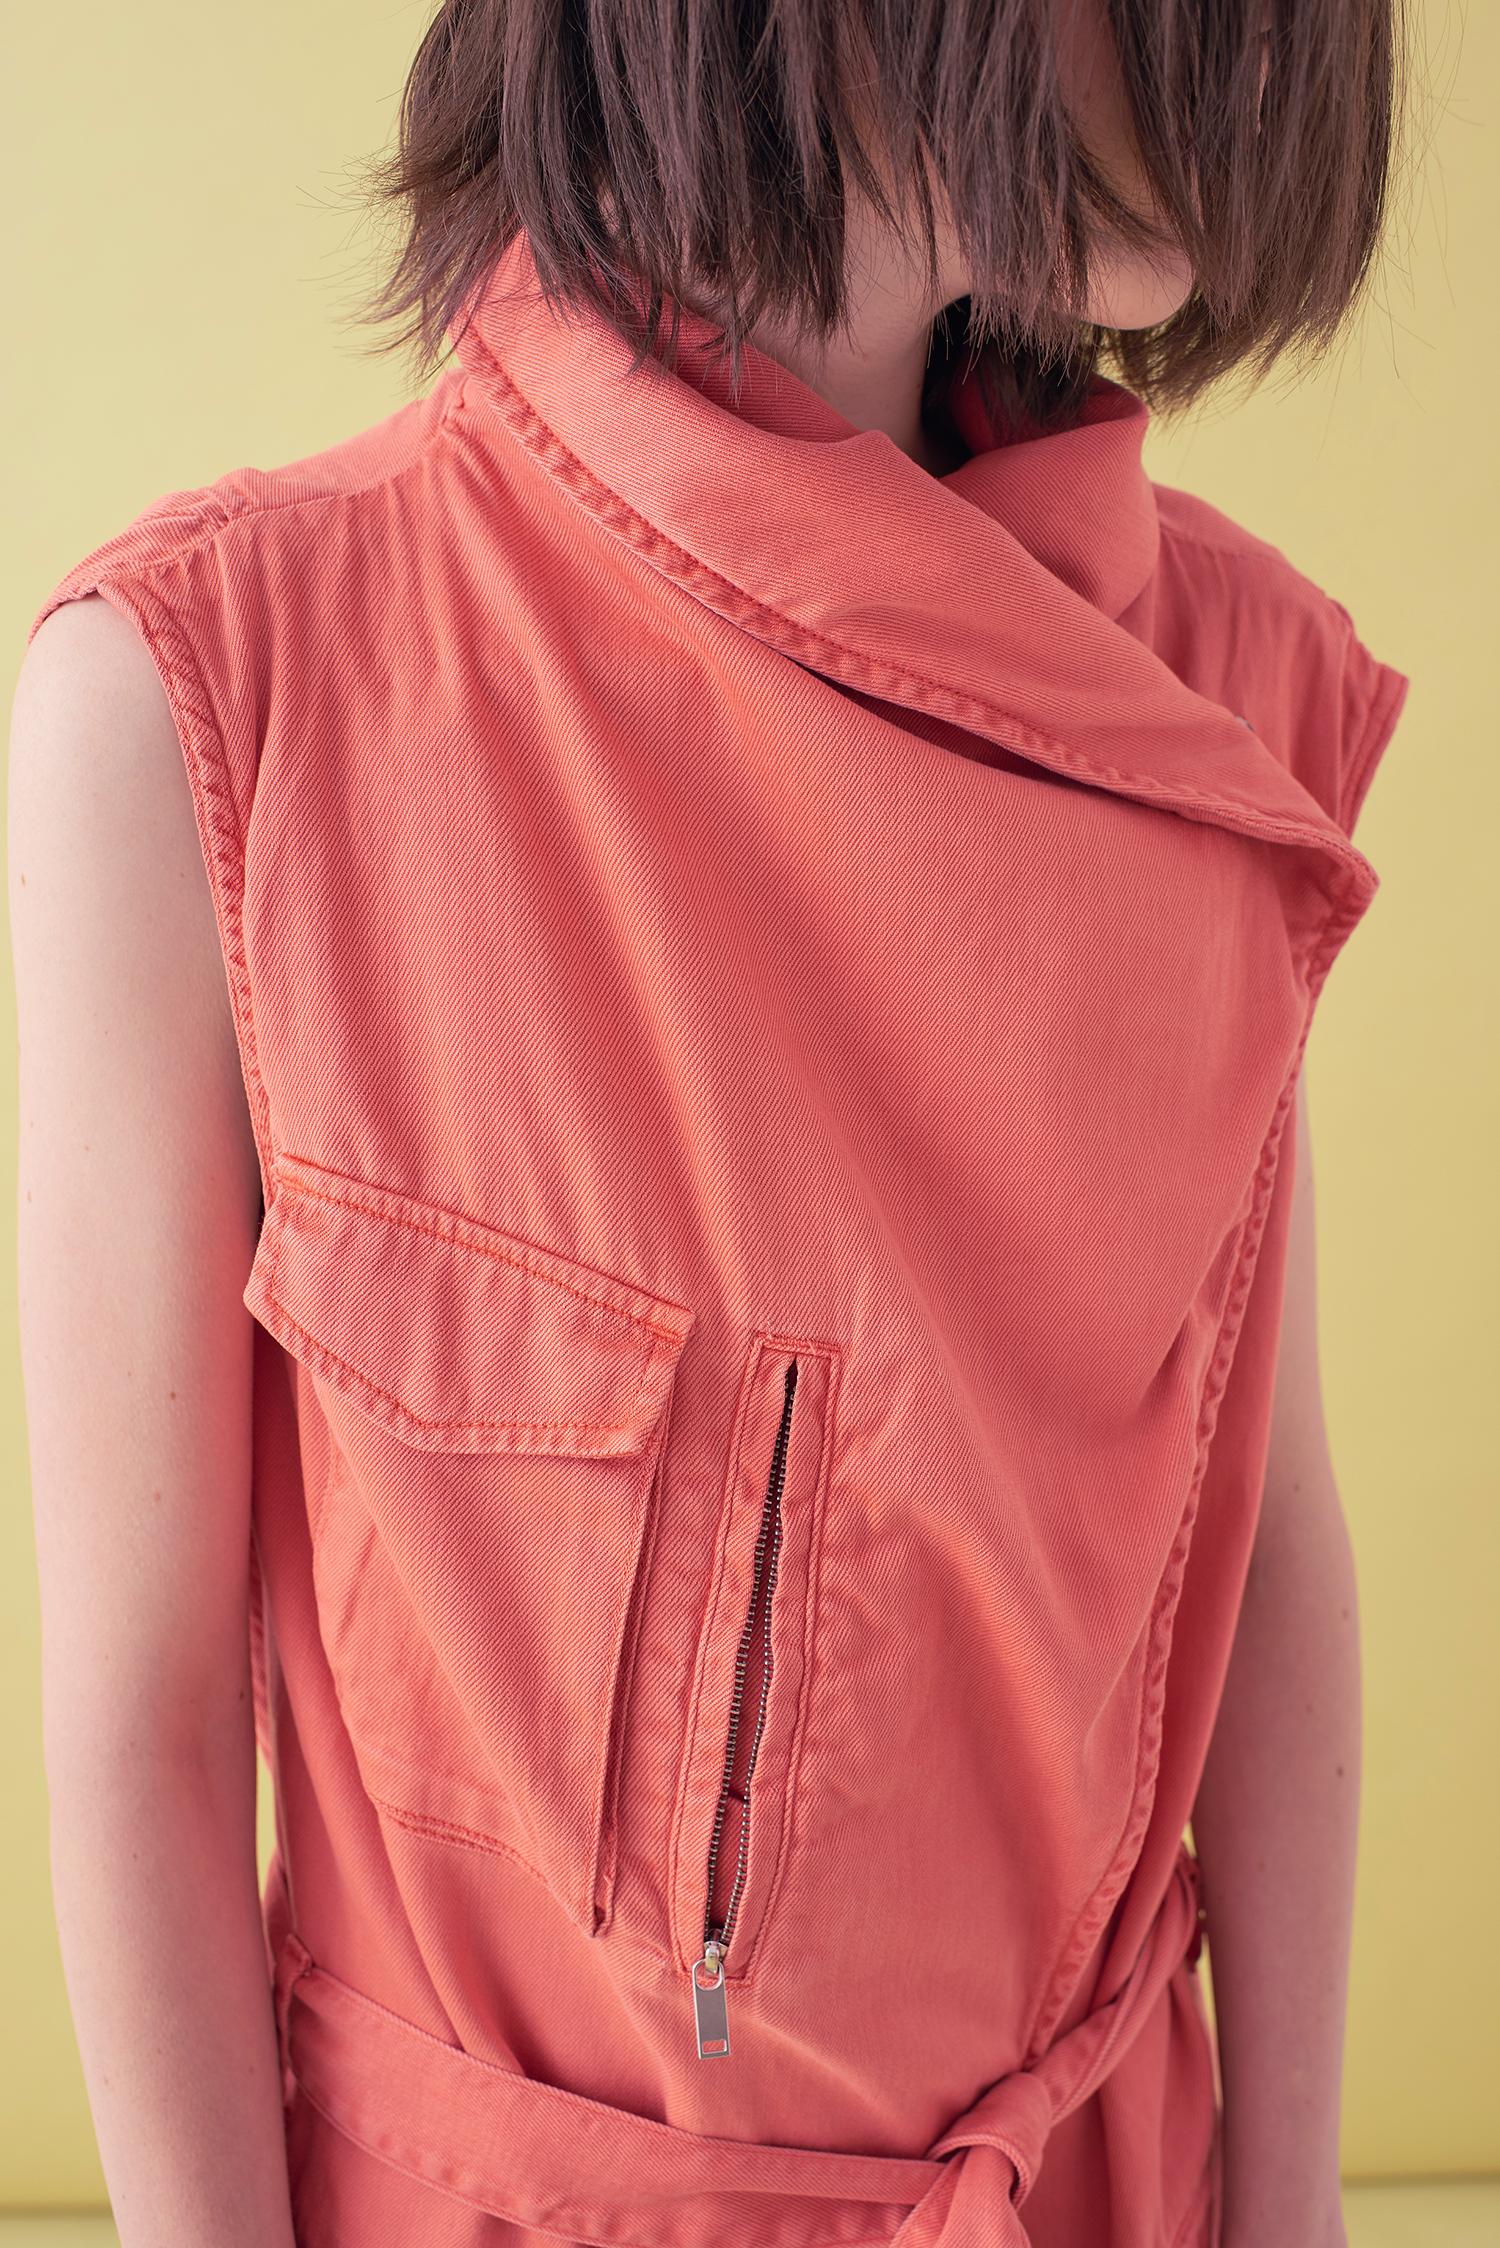 Sarah_Swann_SS17_39_Garment_Dyed_Cotton_Sleeveless_Long_Jacket_Coral_D.jpg